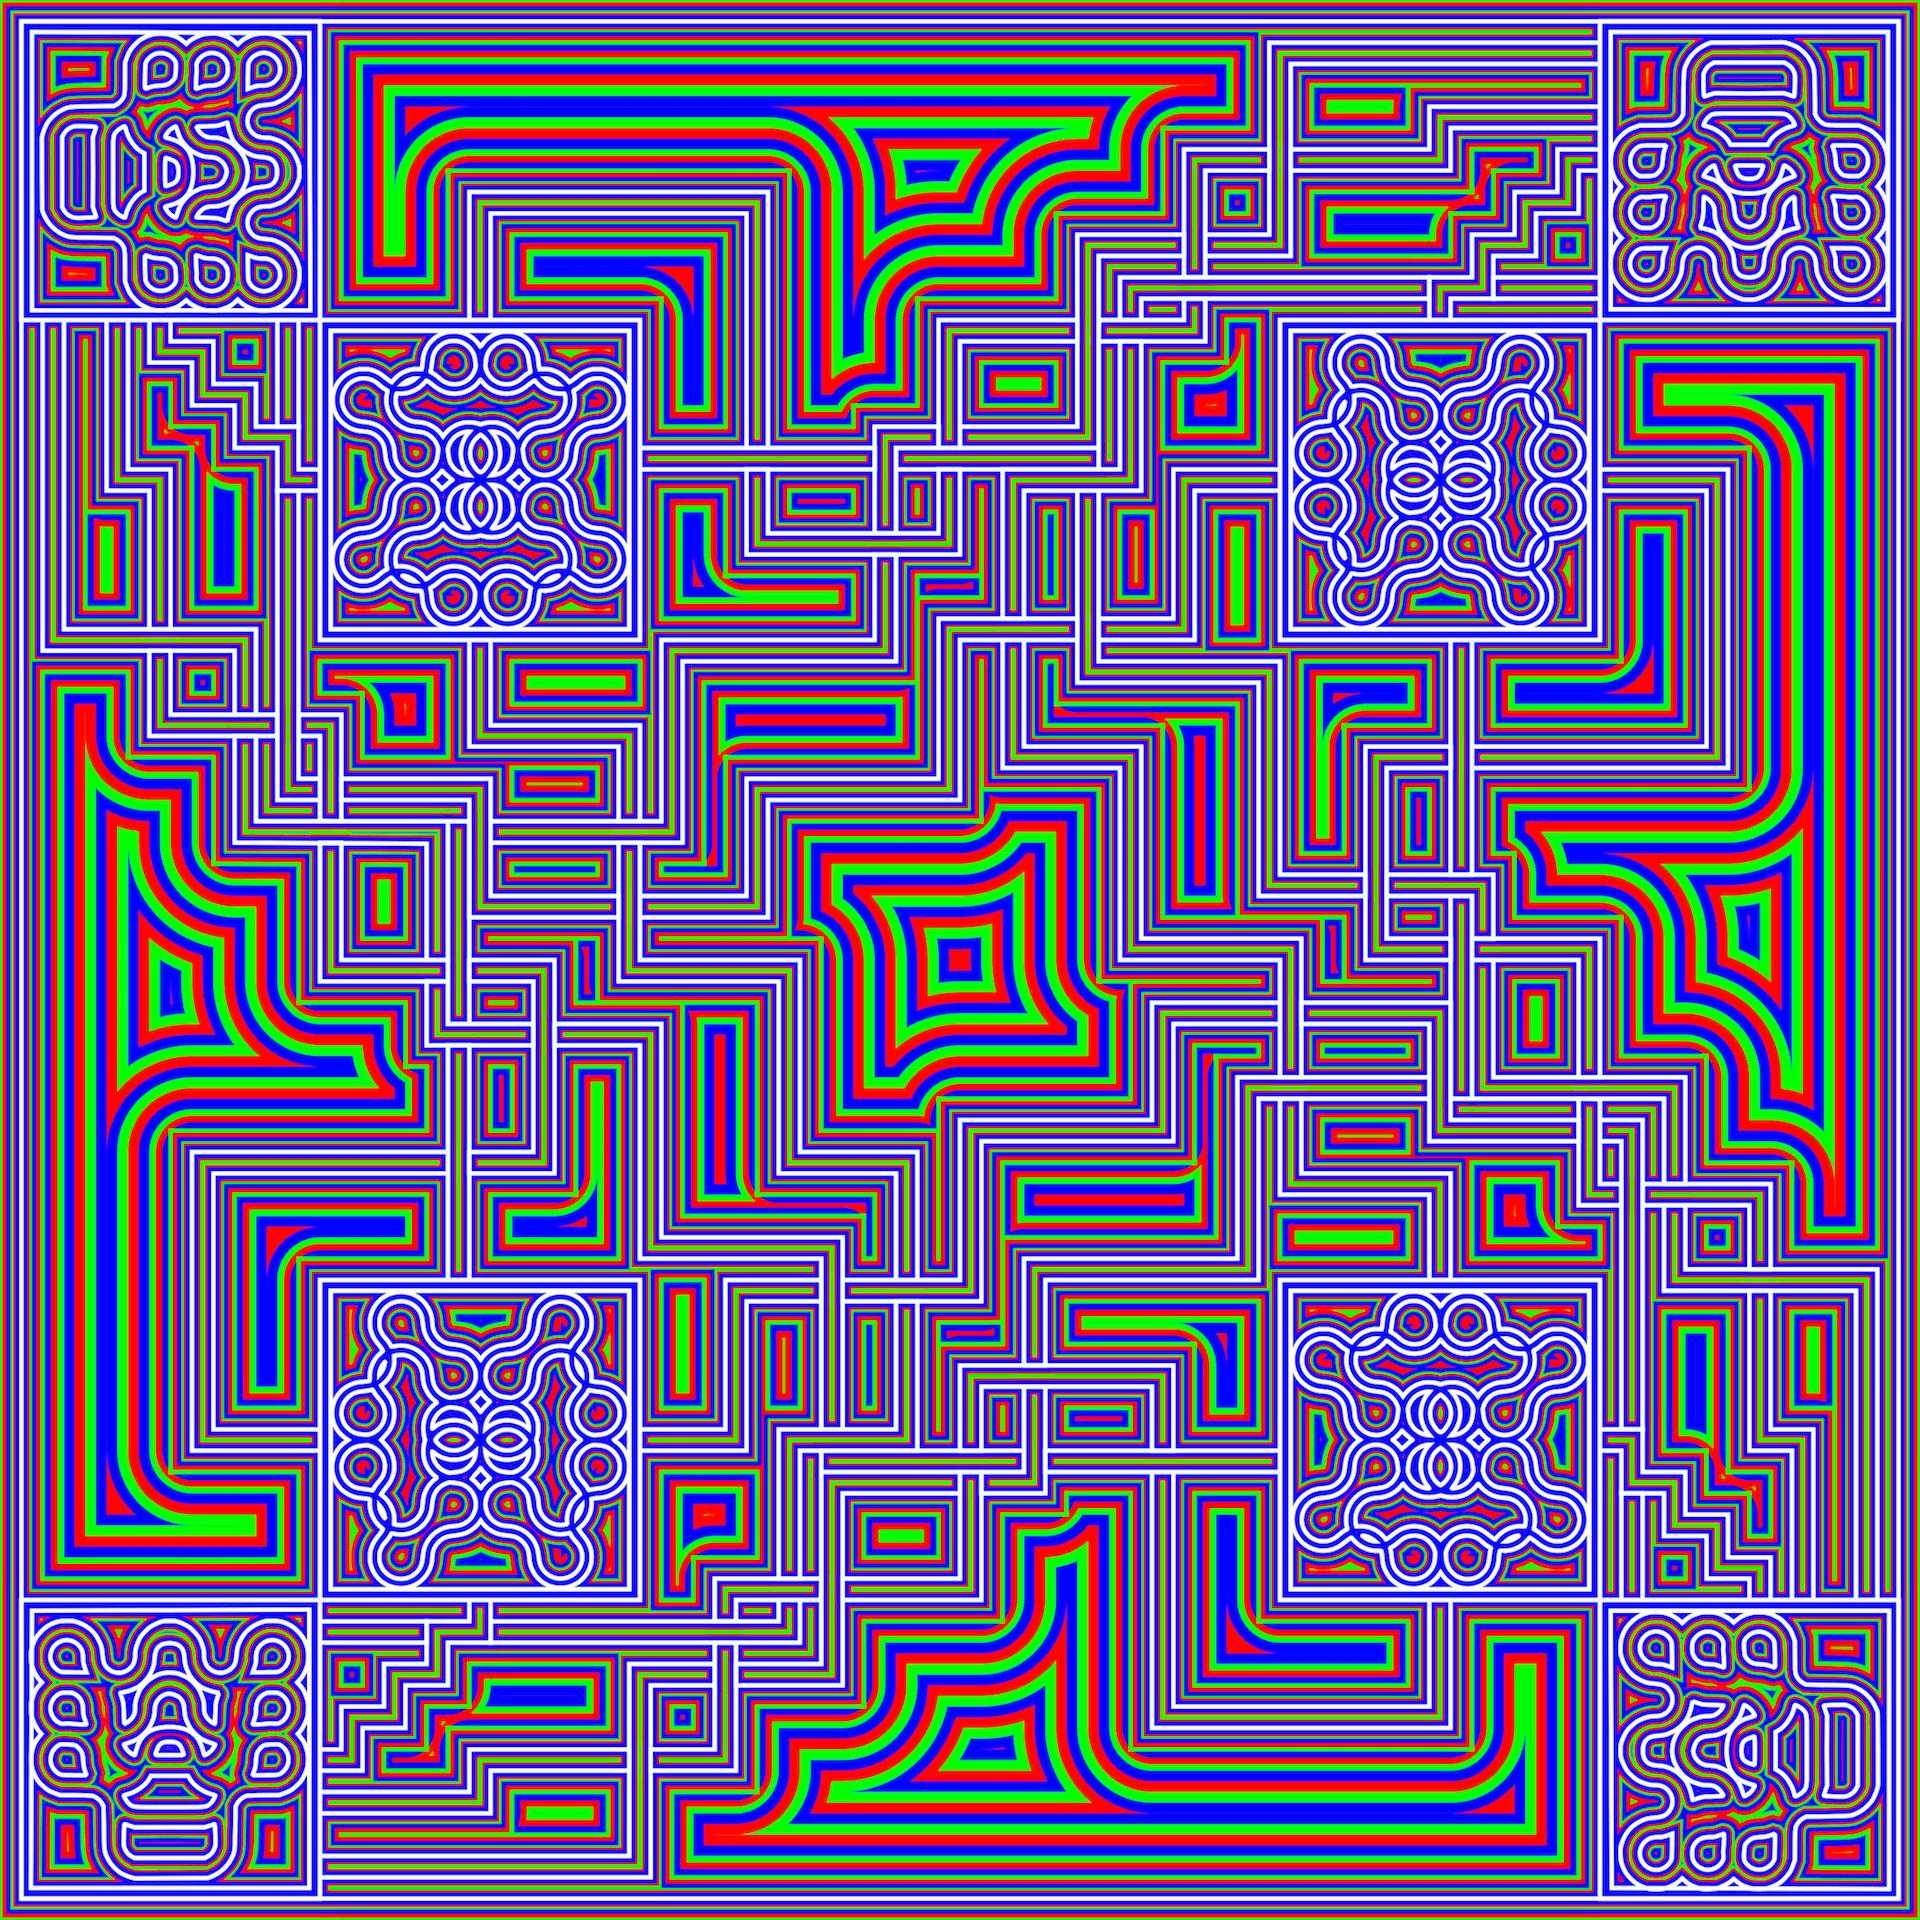 NYの気鋭アートコレクティティブ〈MSHR〉によるエキシビション<Frame Wave>が開催 artculture_191017_framewave_02